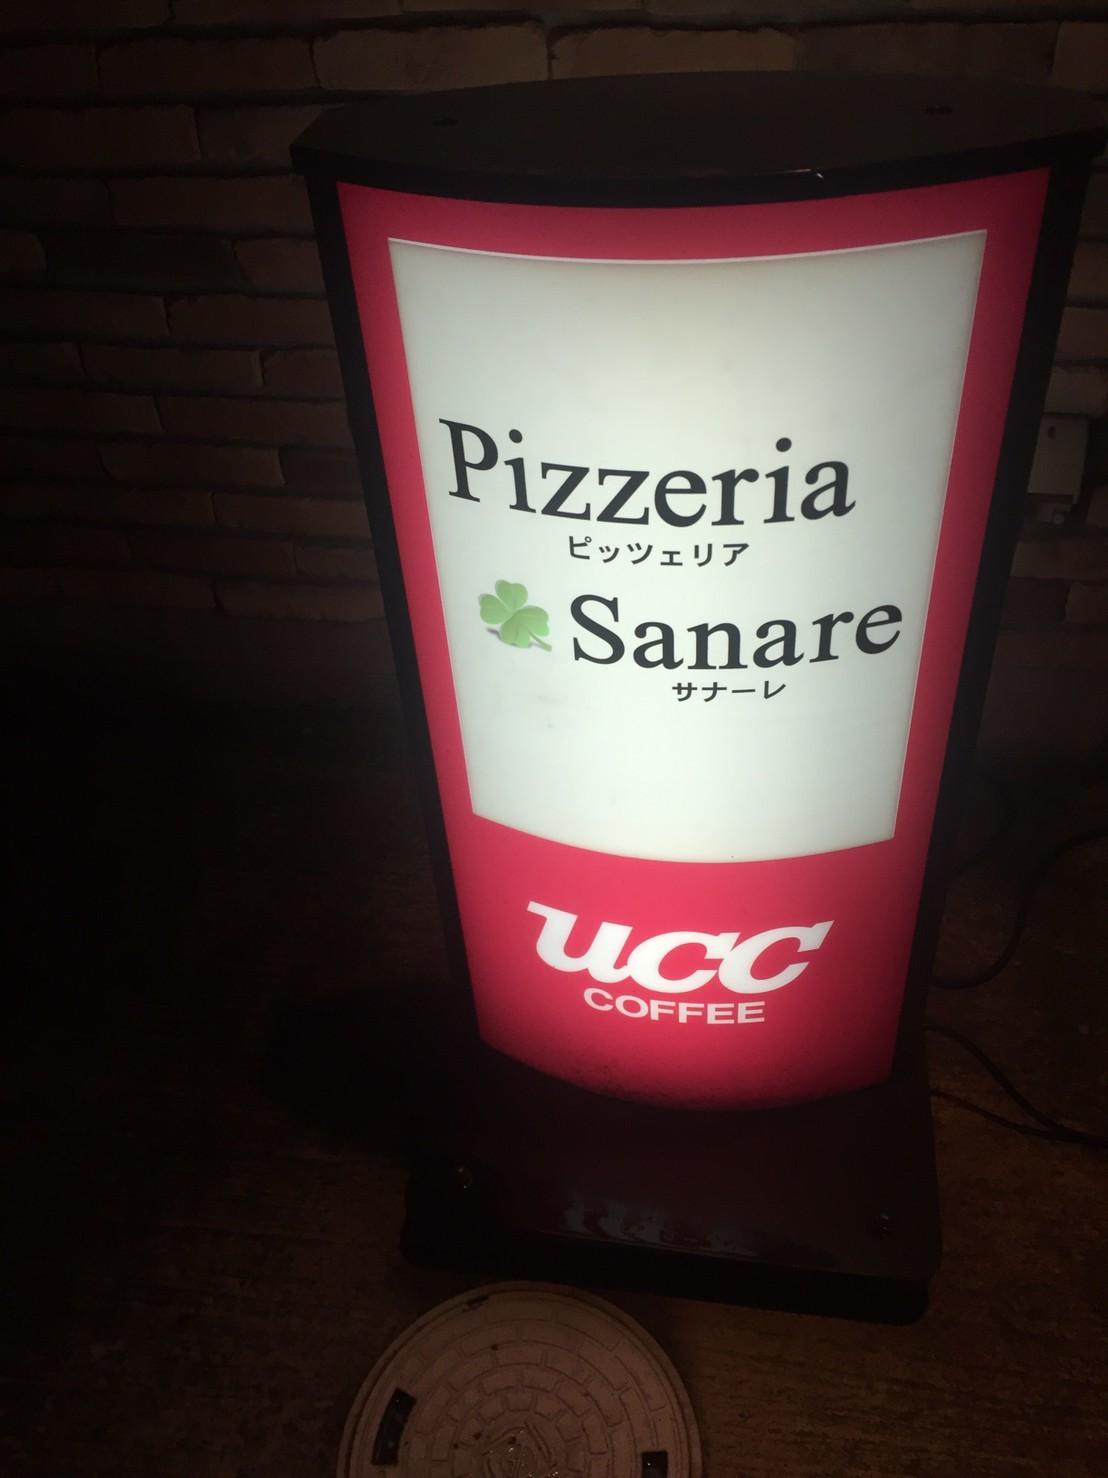 Pizzeria Sanare 取り分けリッチコース_e0115904_23582623.jpg